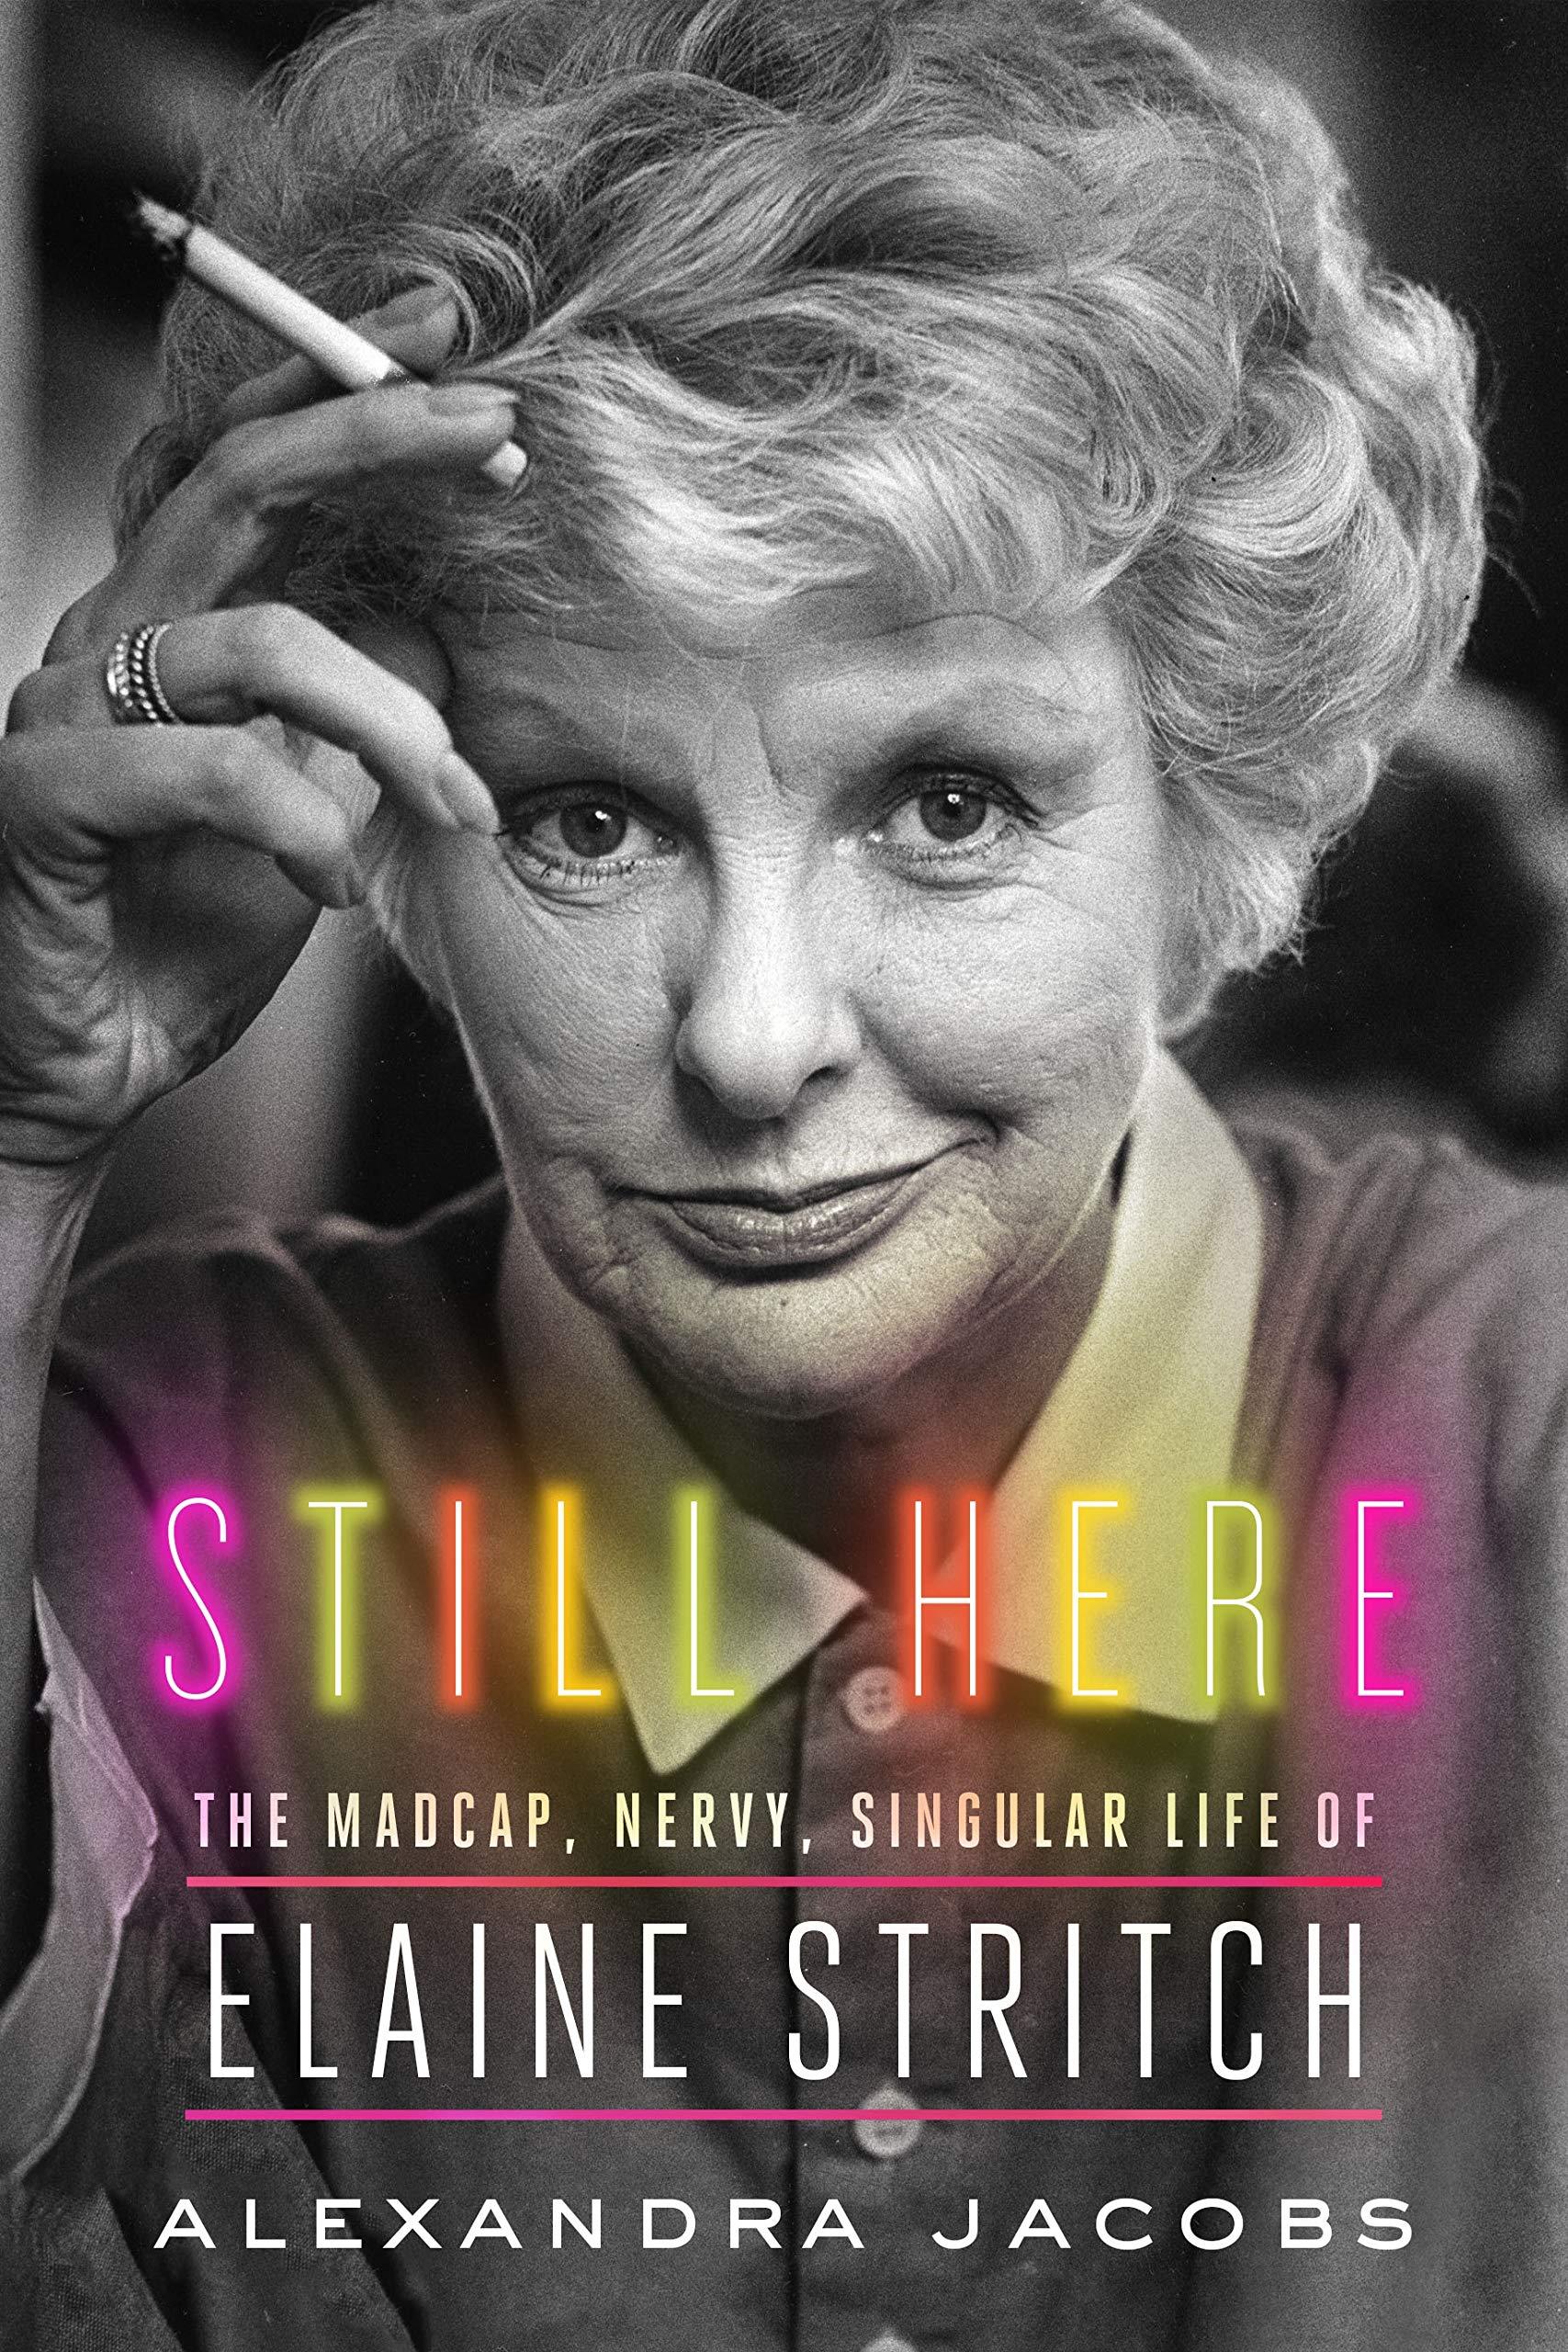 Still Here: The Madcap, Nervy, Singular Life of Elaine Stritch